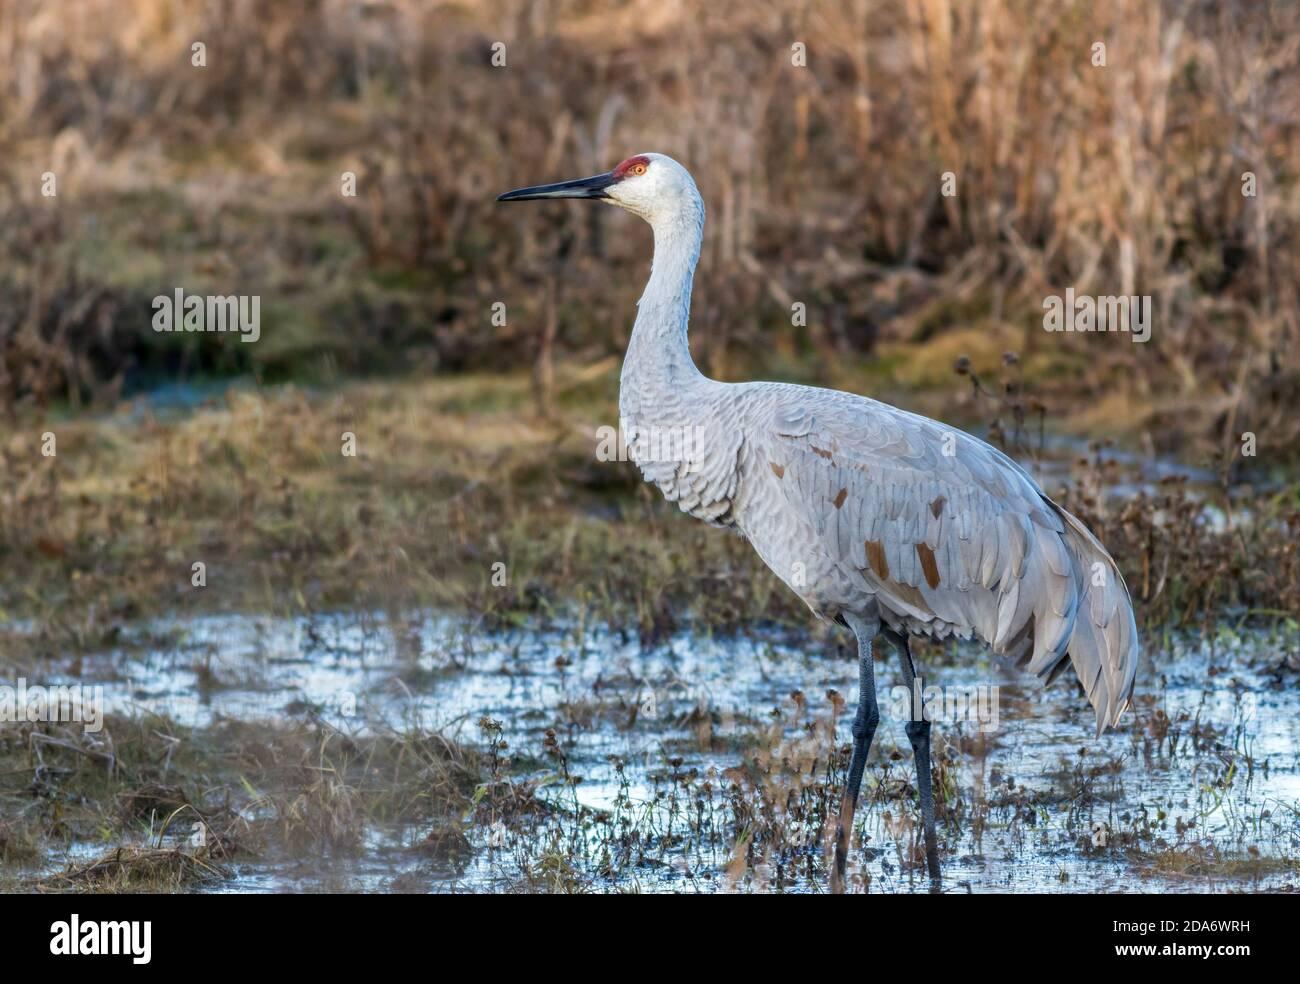 Sandhill Crane, Grus canadensis, moving around the golden grasses in the marsh Stock Photo